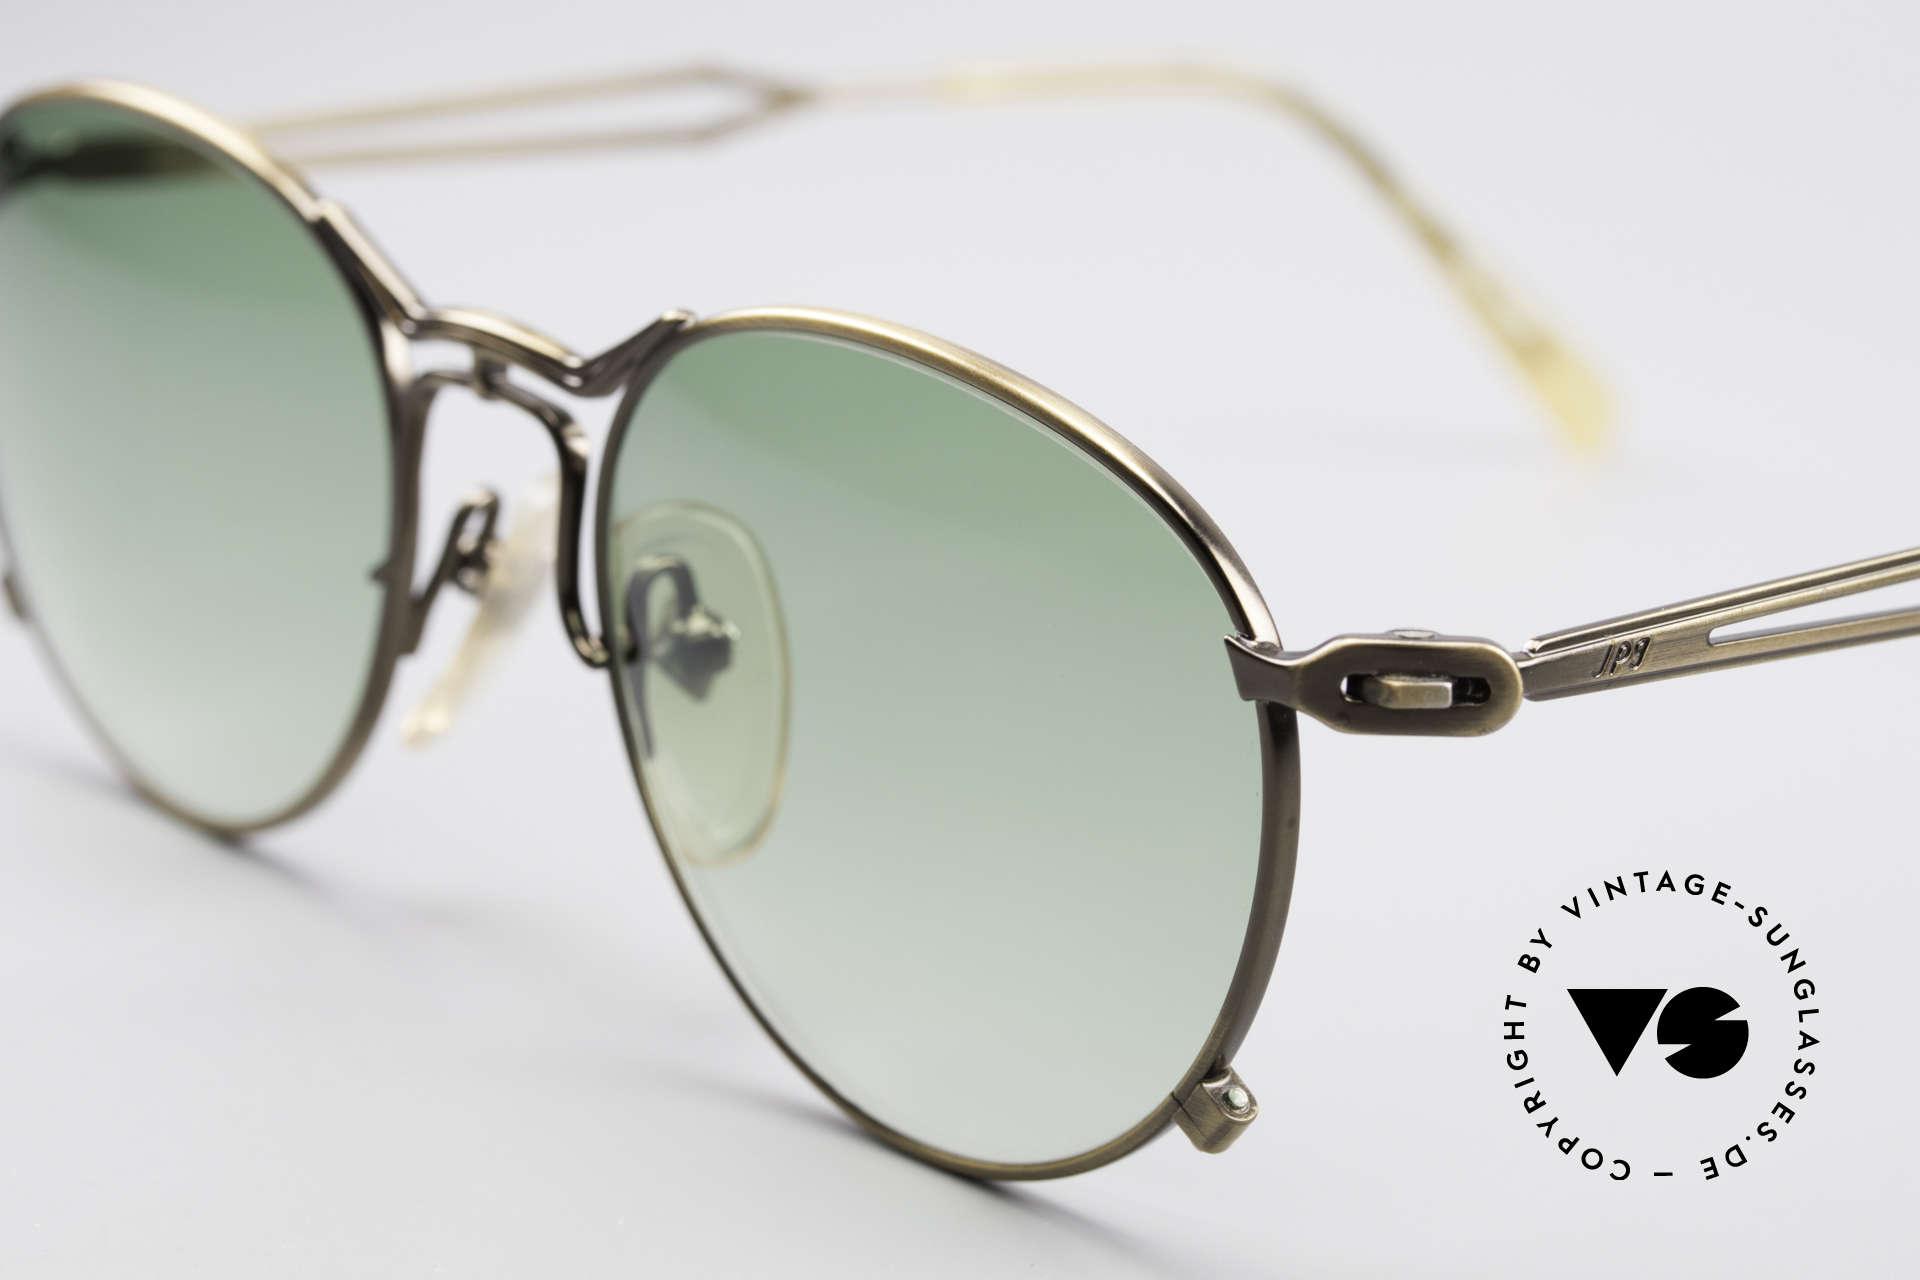 Jean Paul Gaultier 55-2177 True Vintage No Retro Frame, with elegant green-gradient sun lenses (100% UV prot.), Made for Men and Women